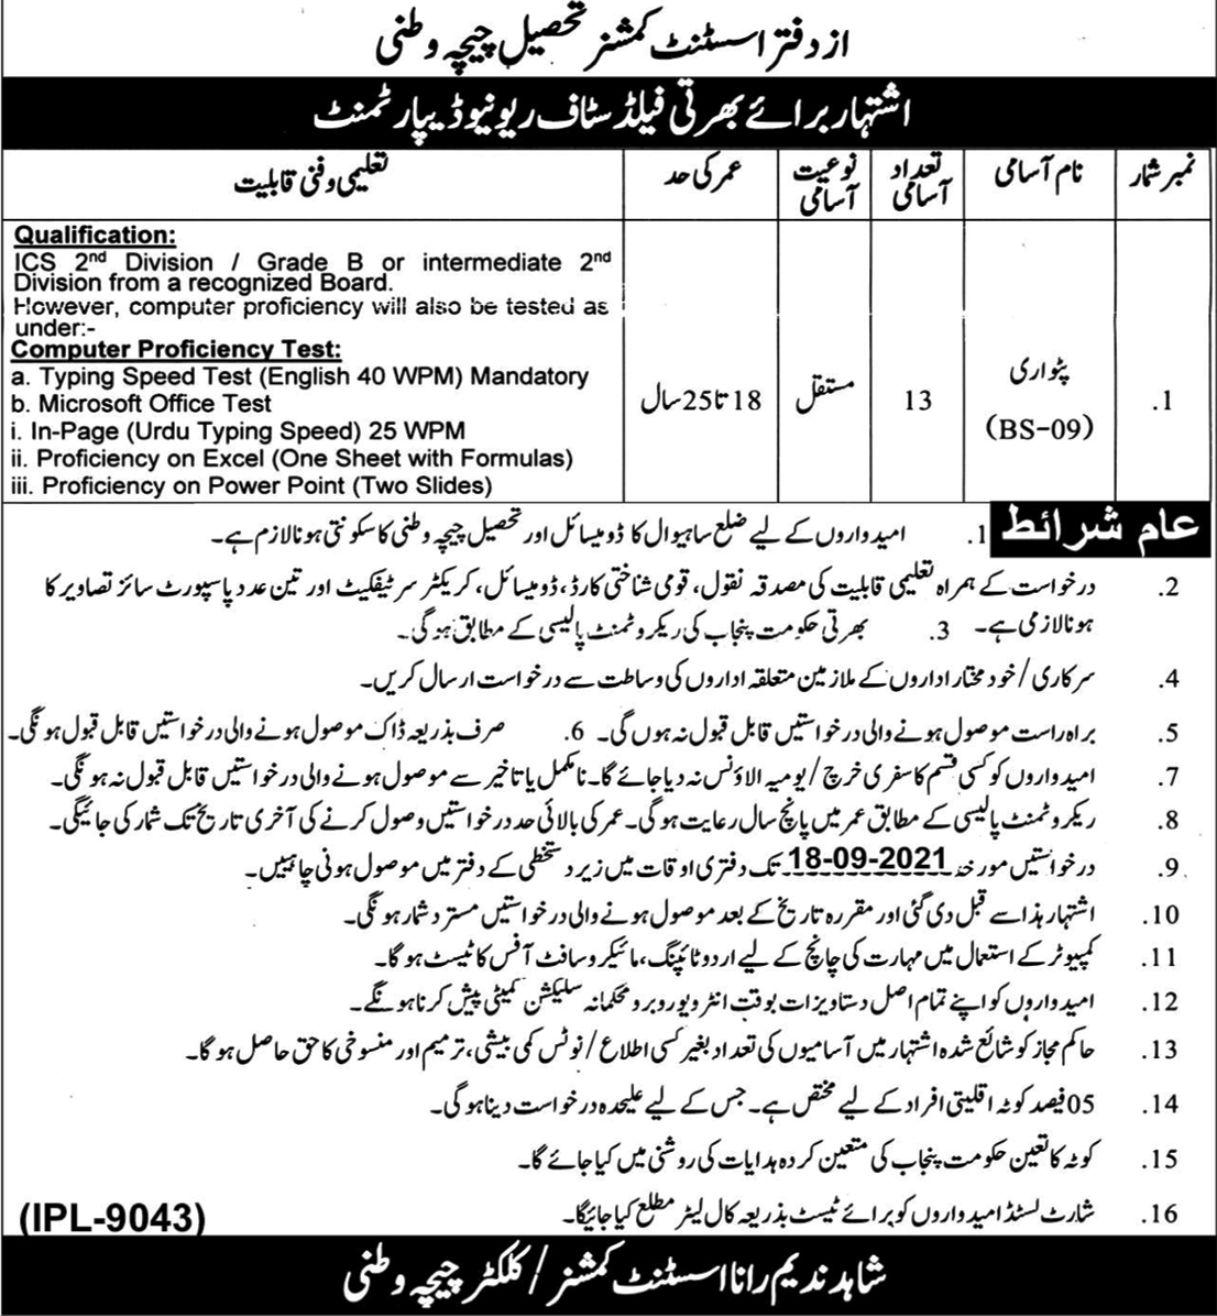 Revenue Department Vacancies 2021 | Dailyjobs.pk 3